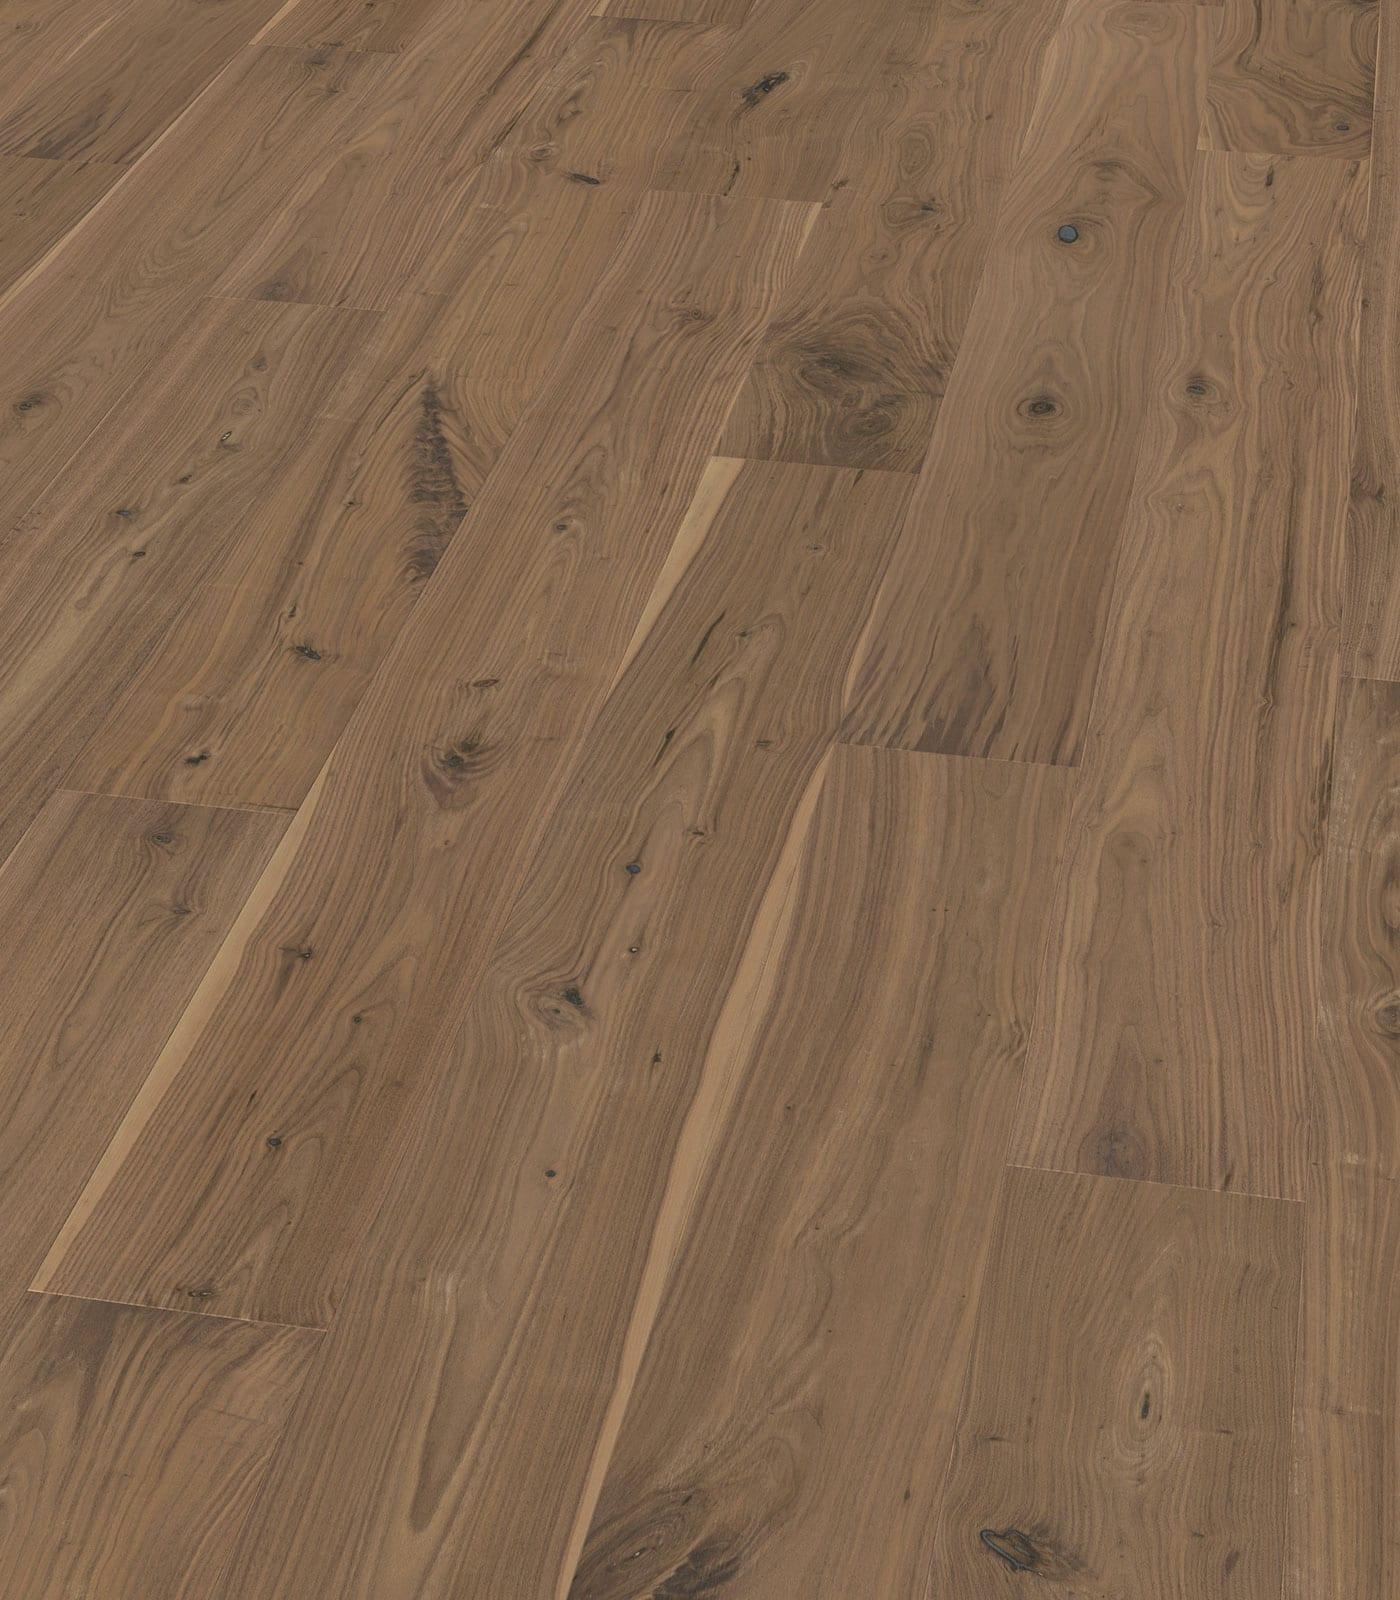 Walnut Polos-Origins Collection-European Walnut floors-angle